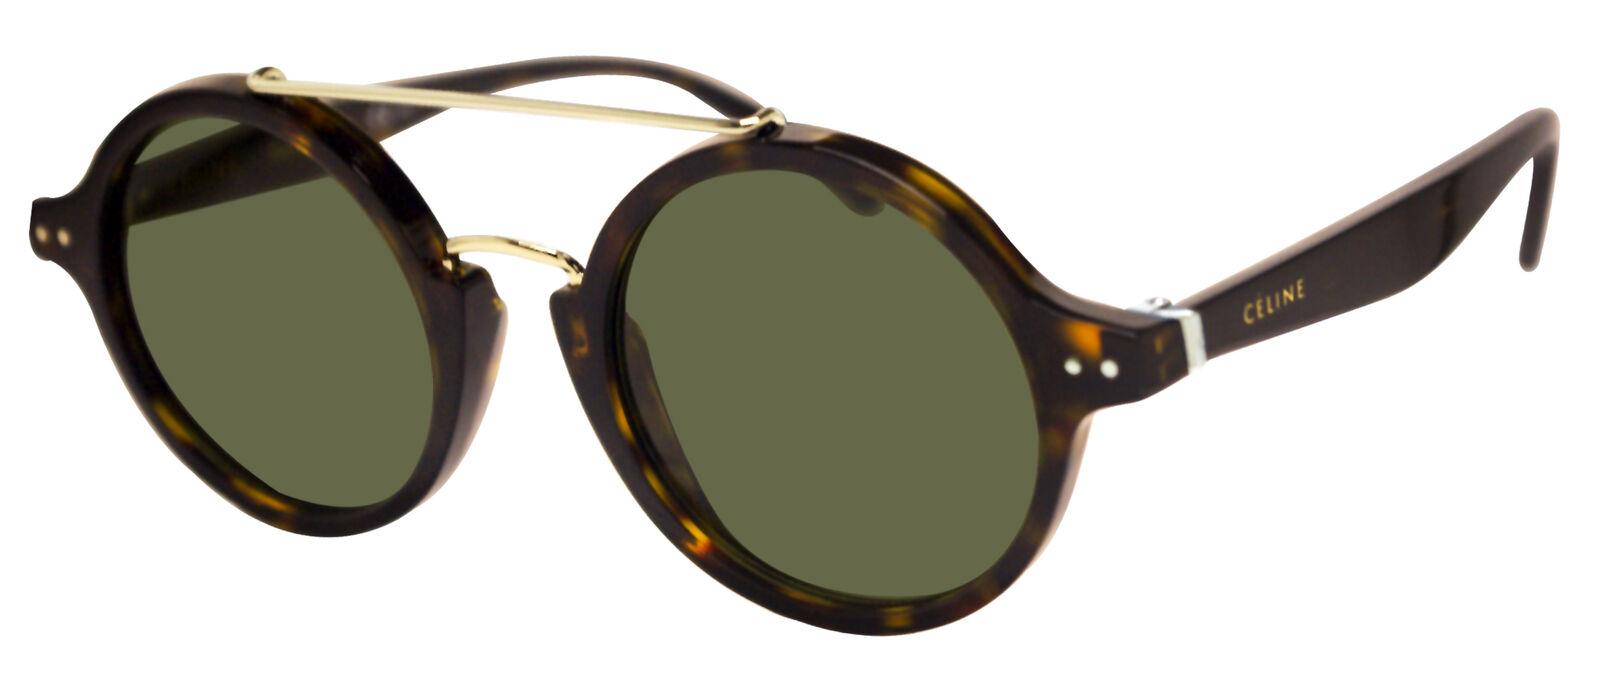 feac6b473ed1 Celine 41436 0861e Dark Havana Green Authentic Sunglasses for sale ...